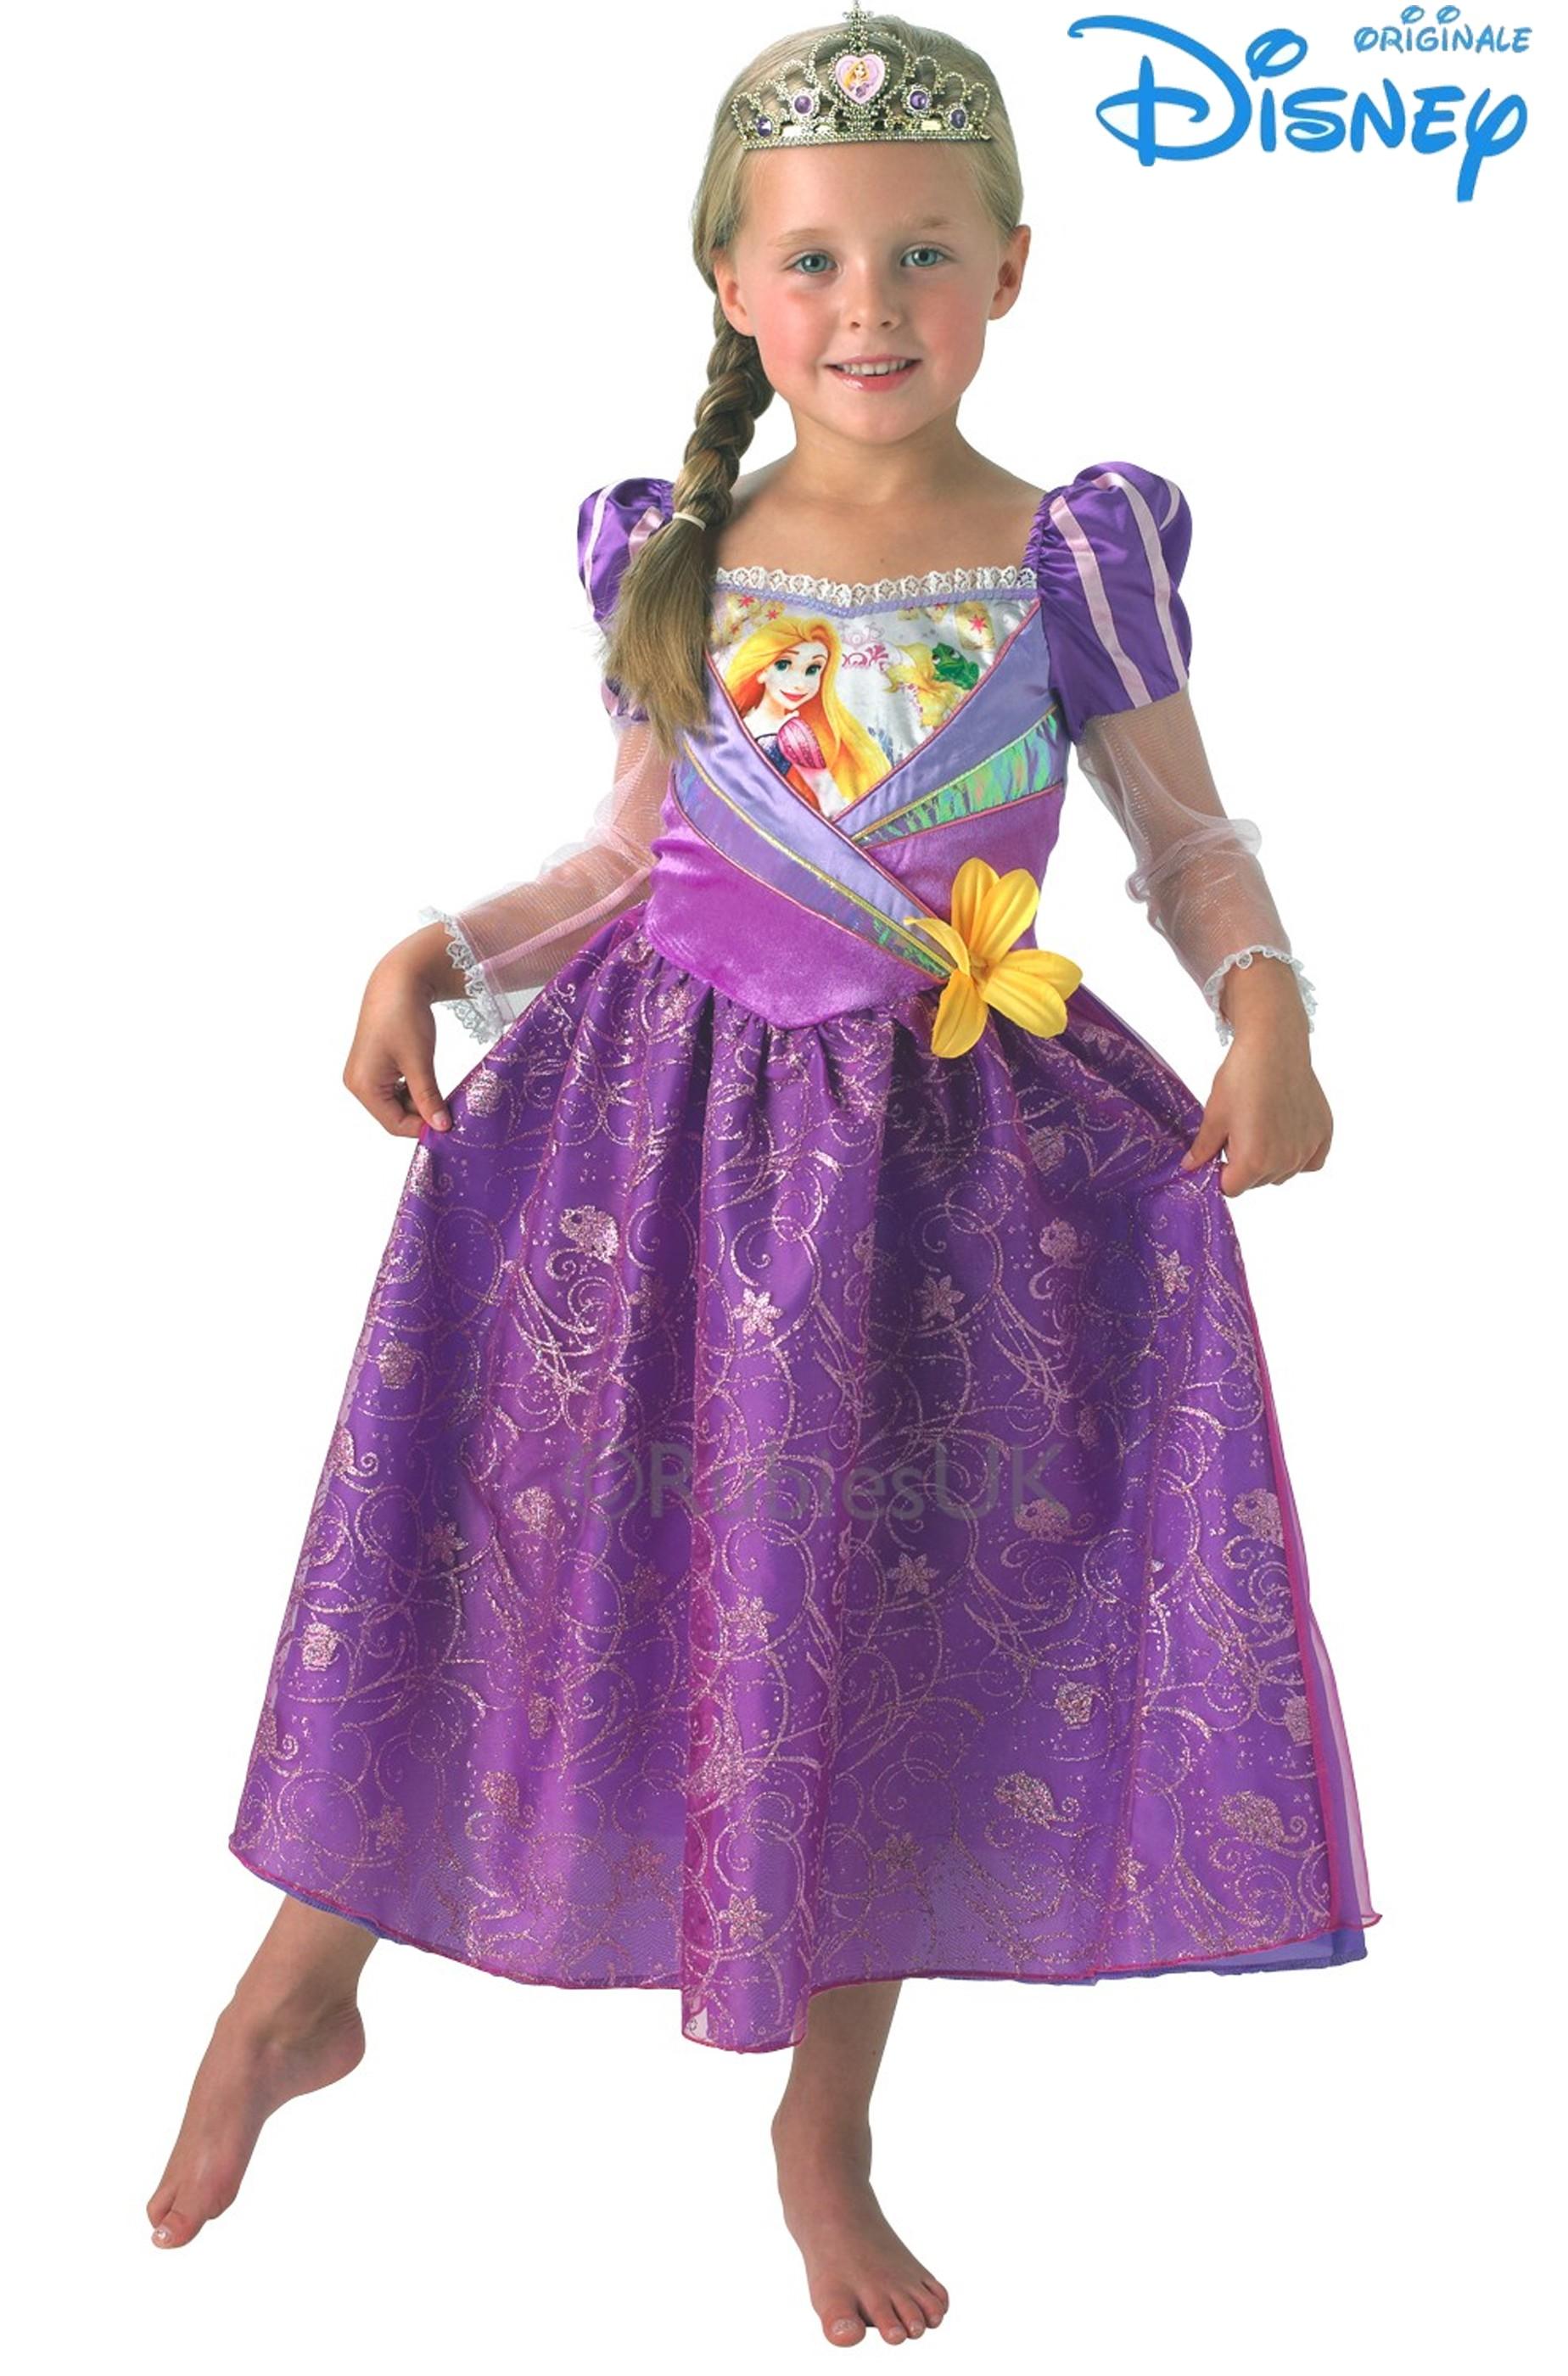 Costume Bambina Disney Rapunzel deluxe daab9cef604